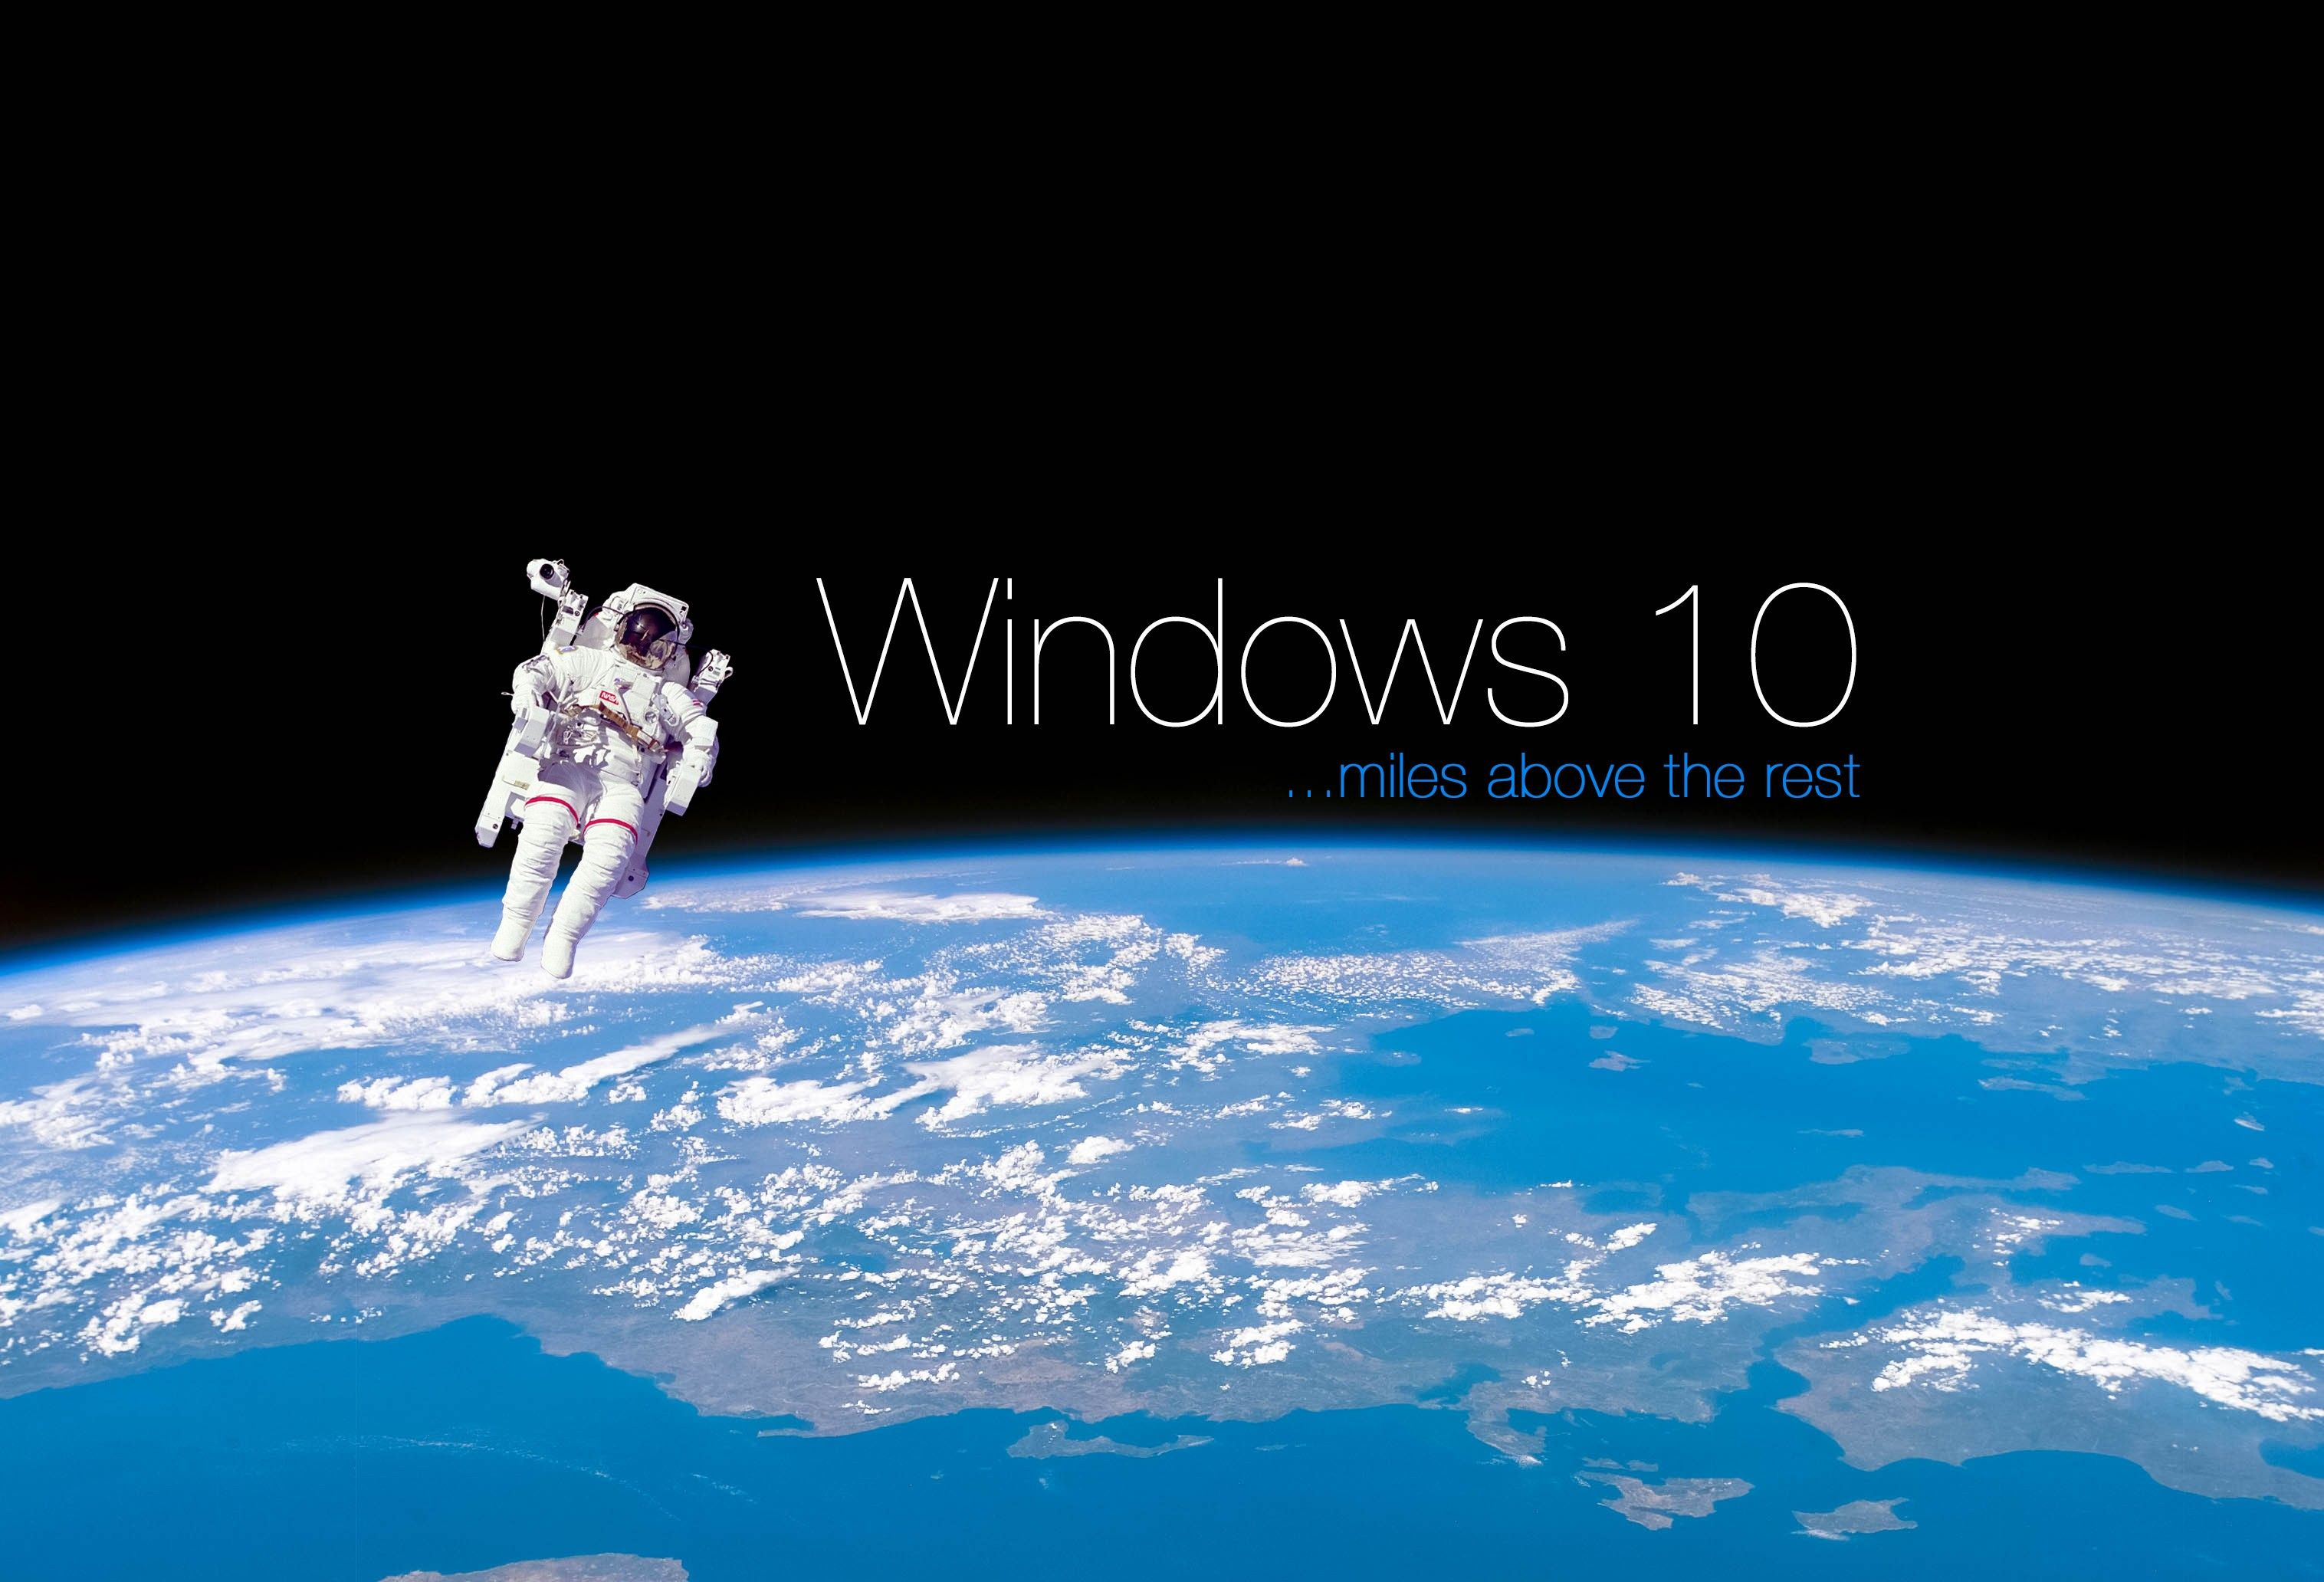 Windows 10 Wallpapers Desktop Backgrounds 4 Hd Wallpapers